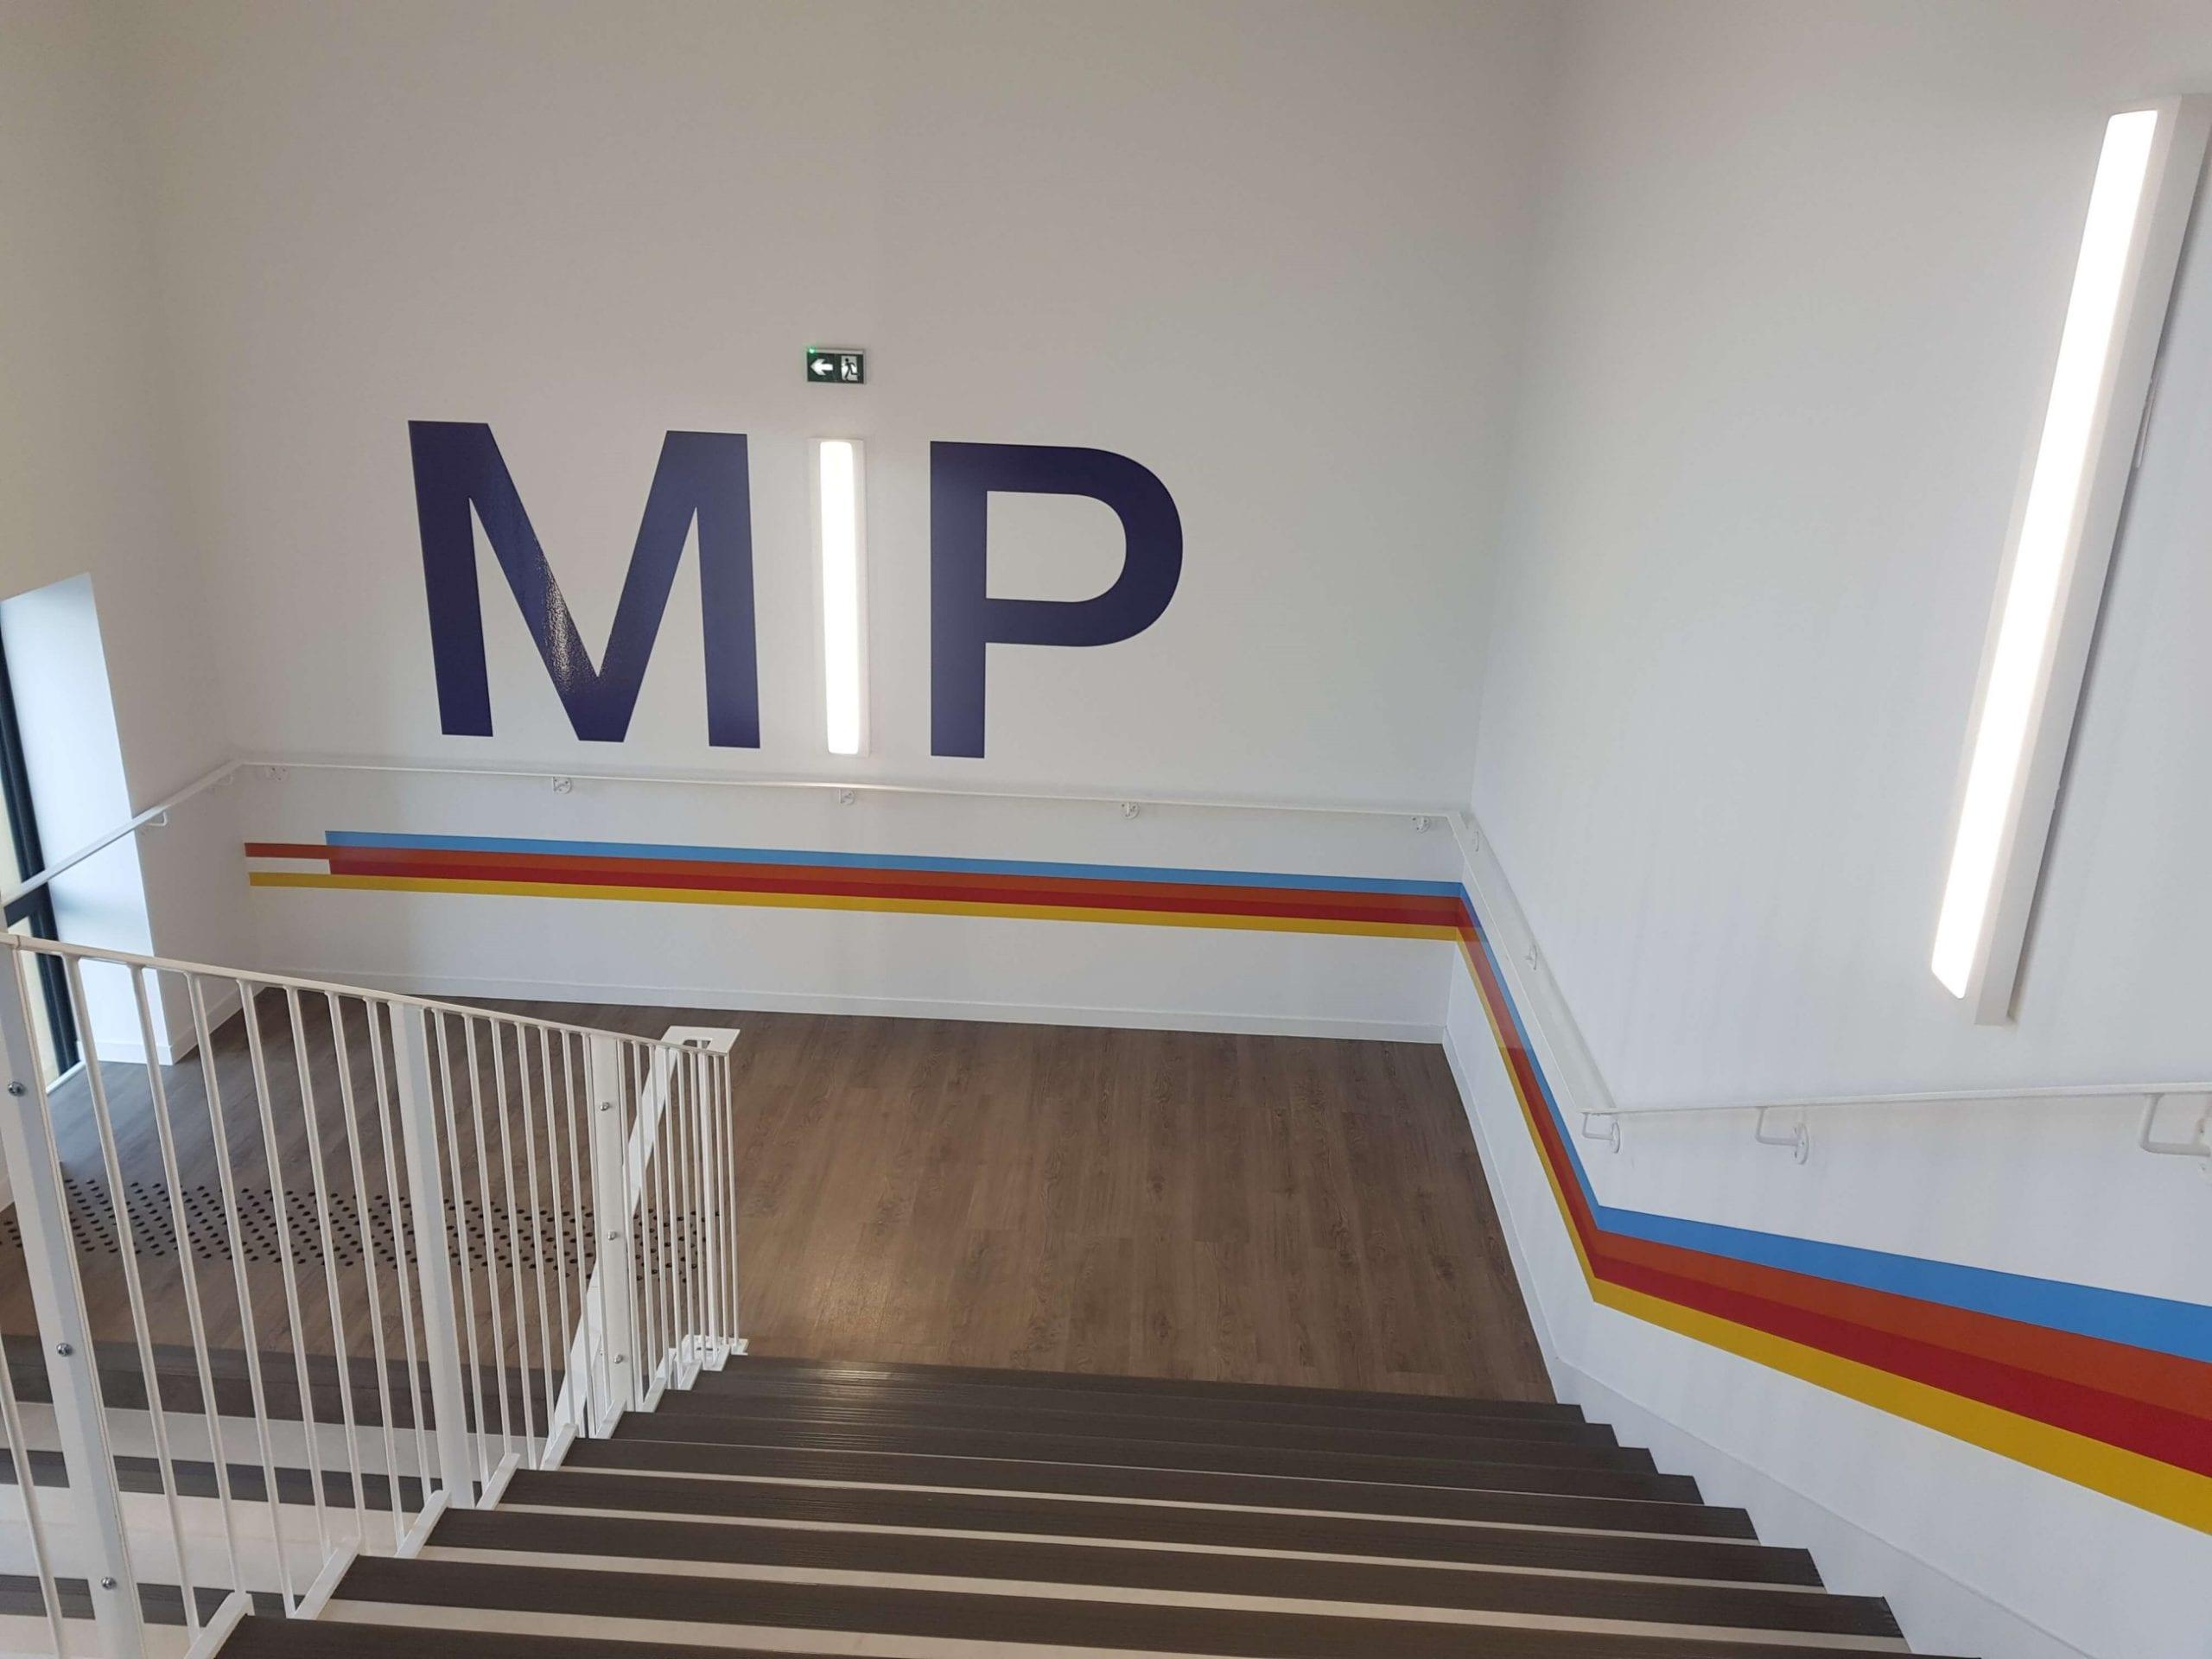 MP Turcat escalier 2